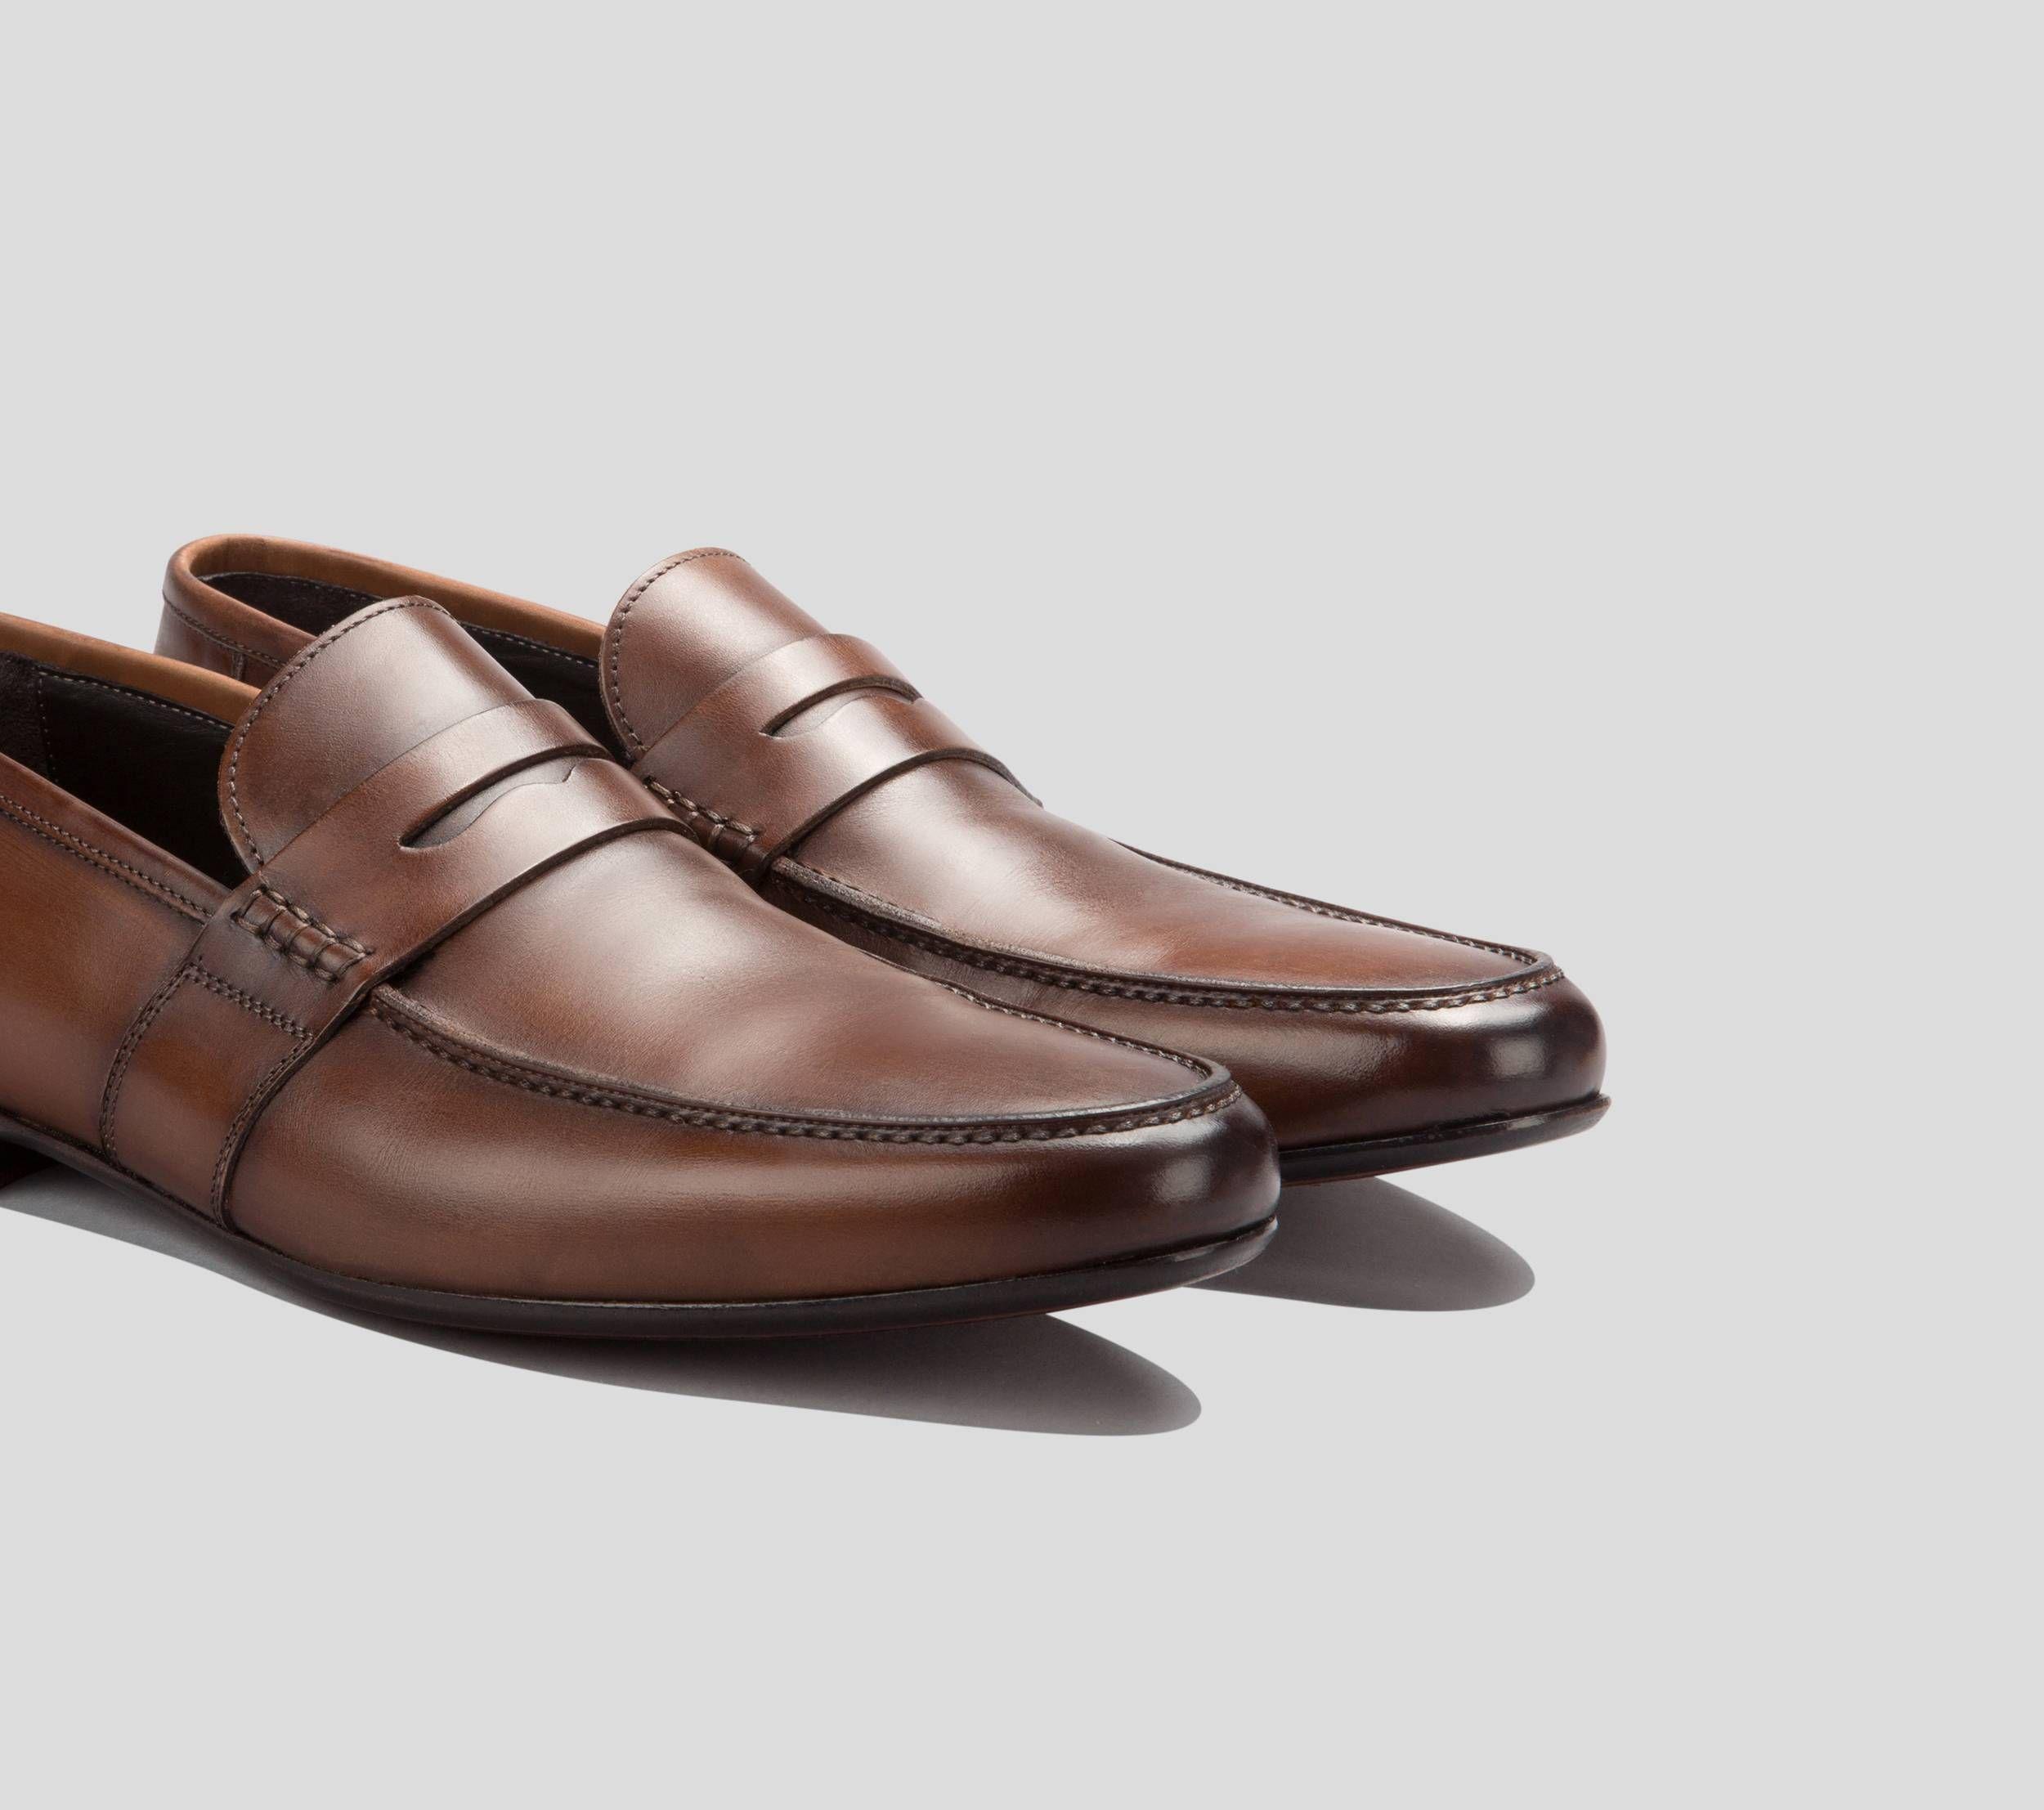 08608660cd6ba The Volo | Stuff I want | Loafers men, Italian shoes, Gentleman shoes